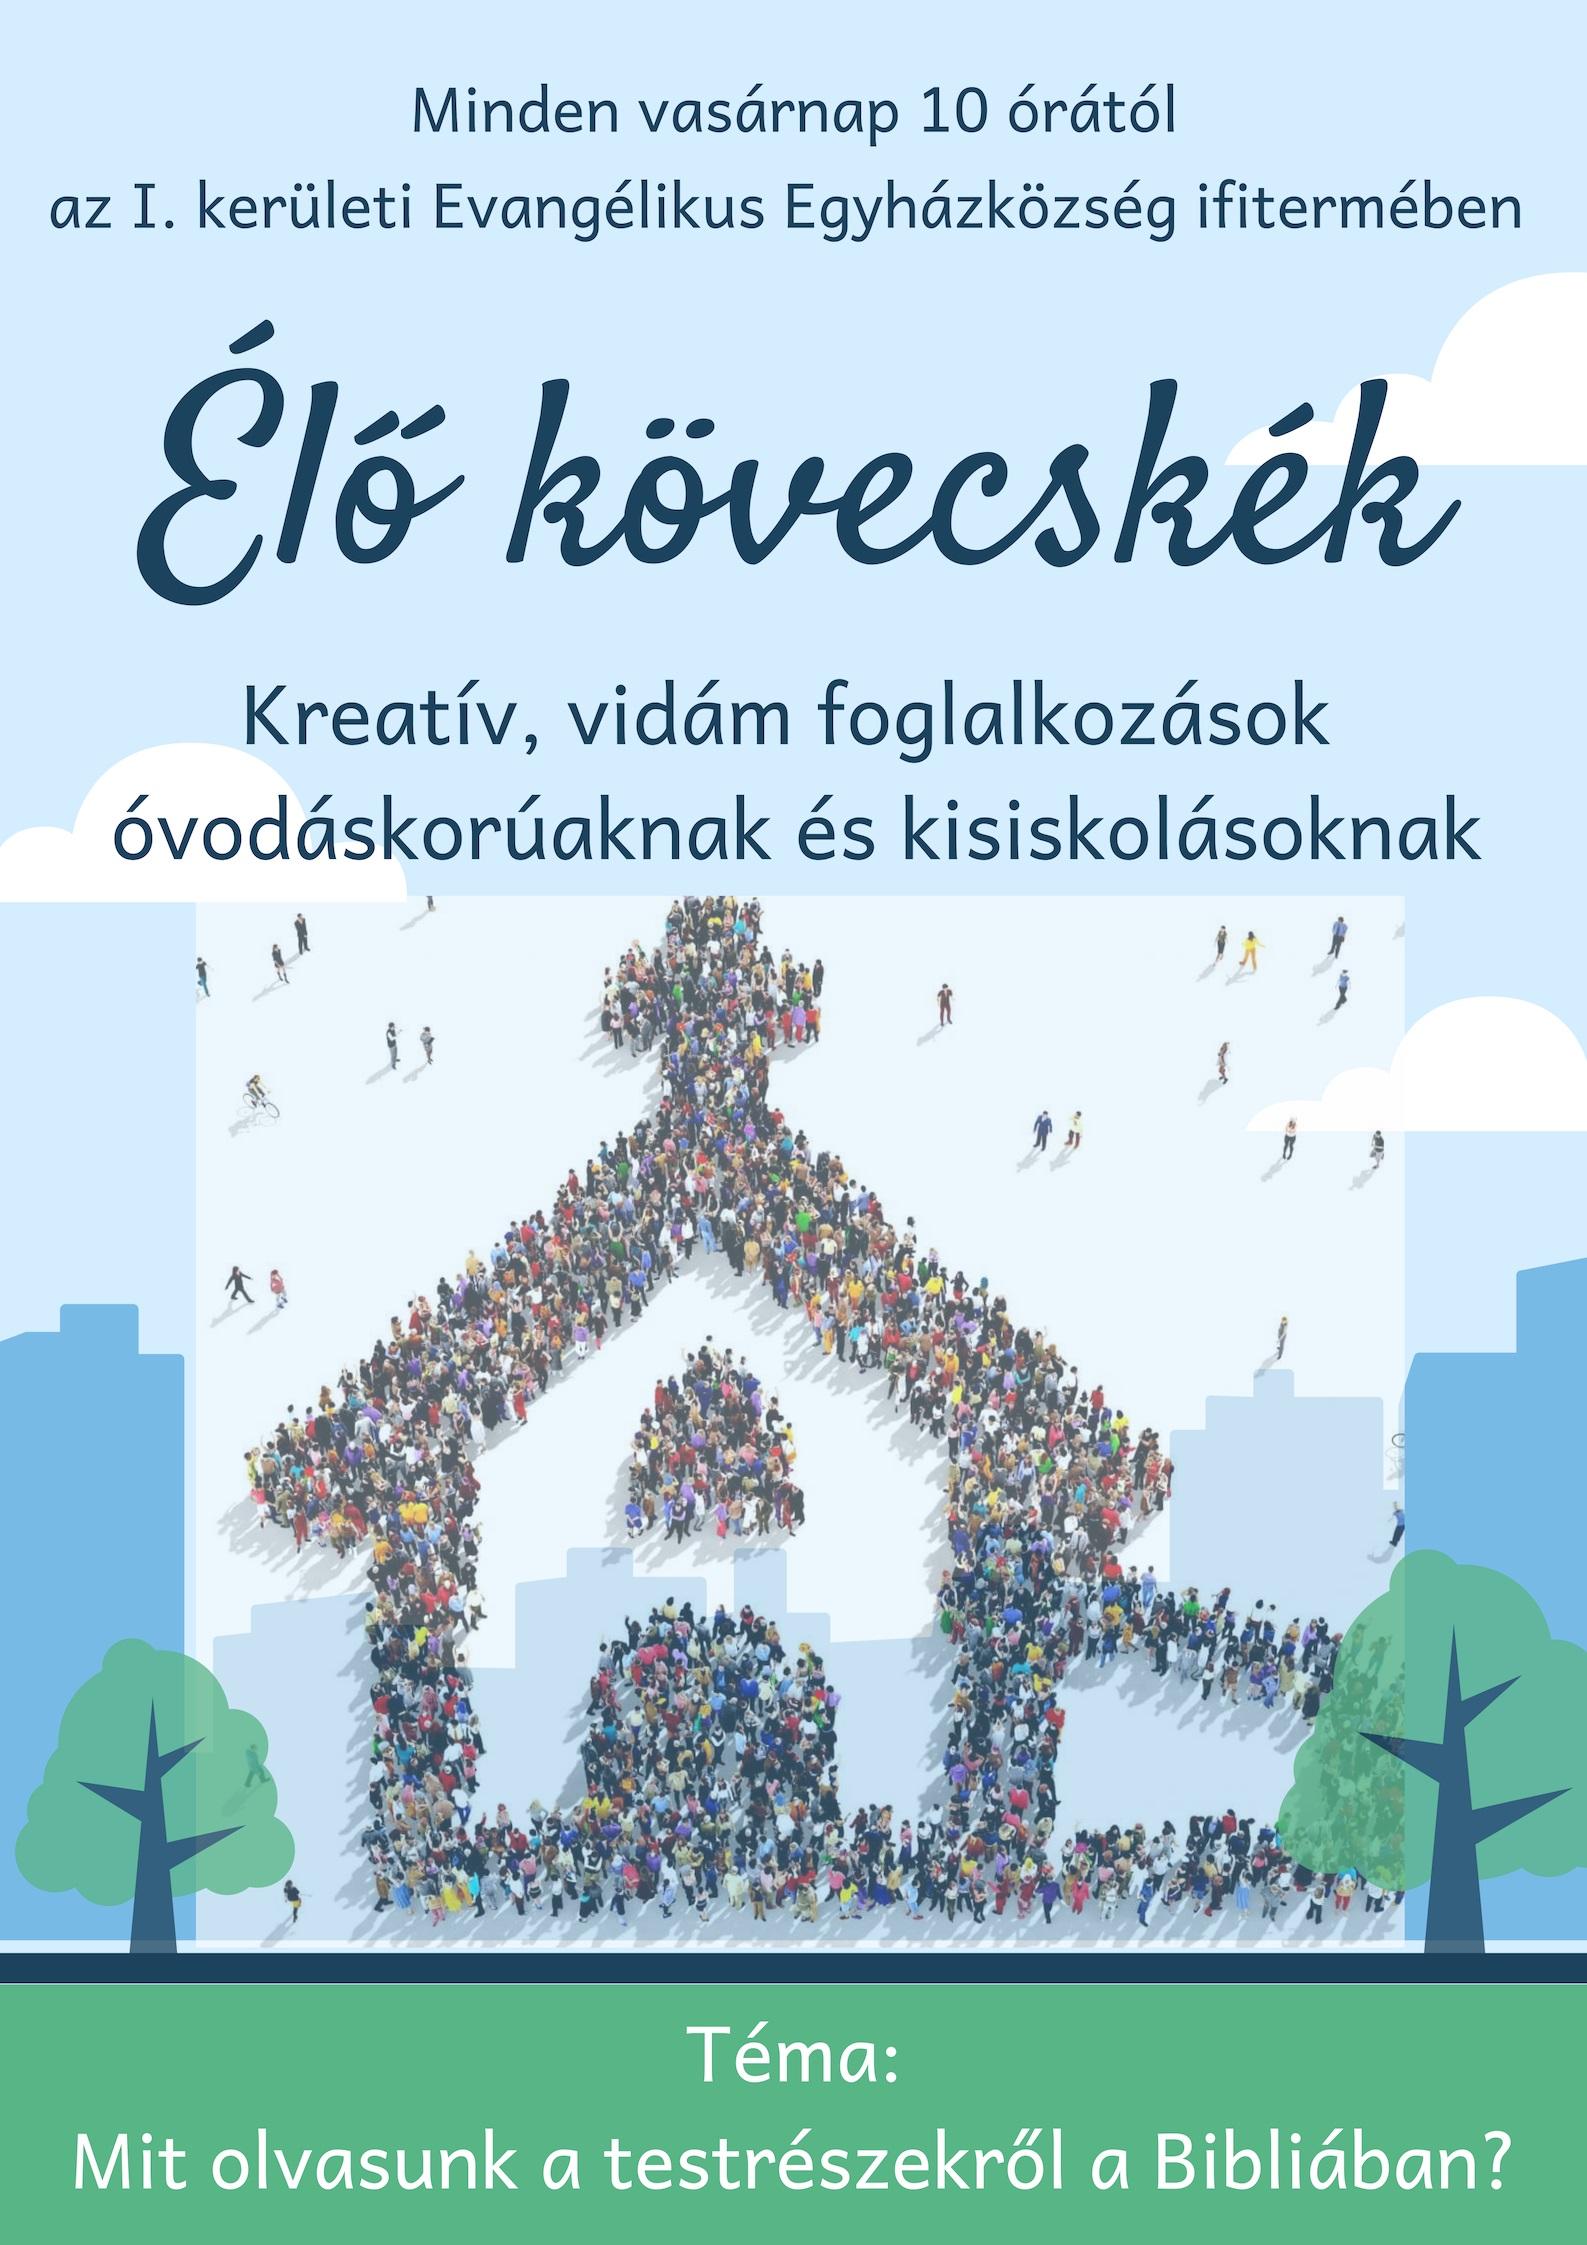 elo_kovecskek8.jpg